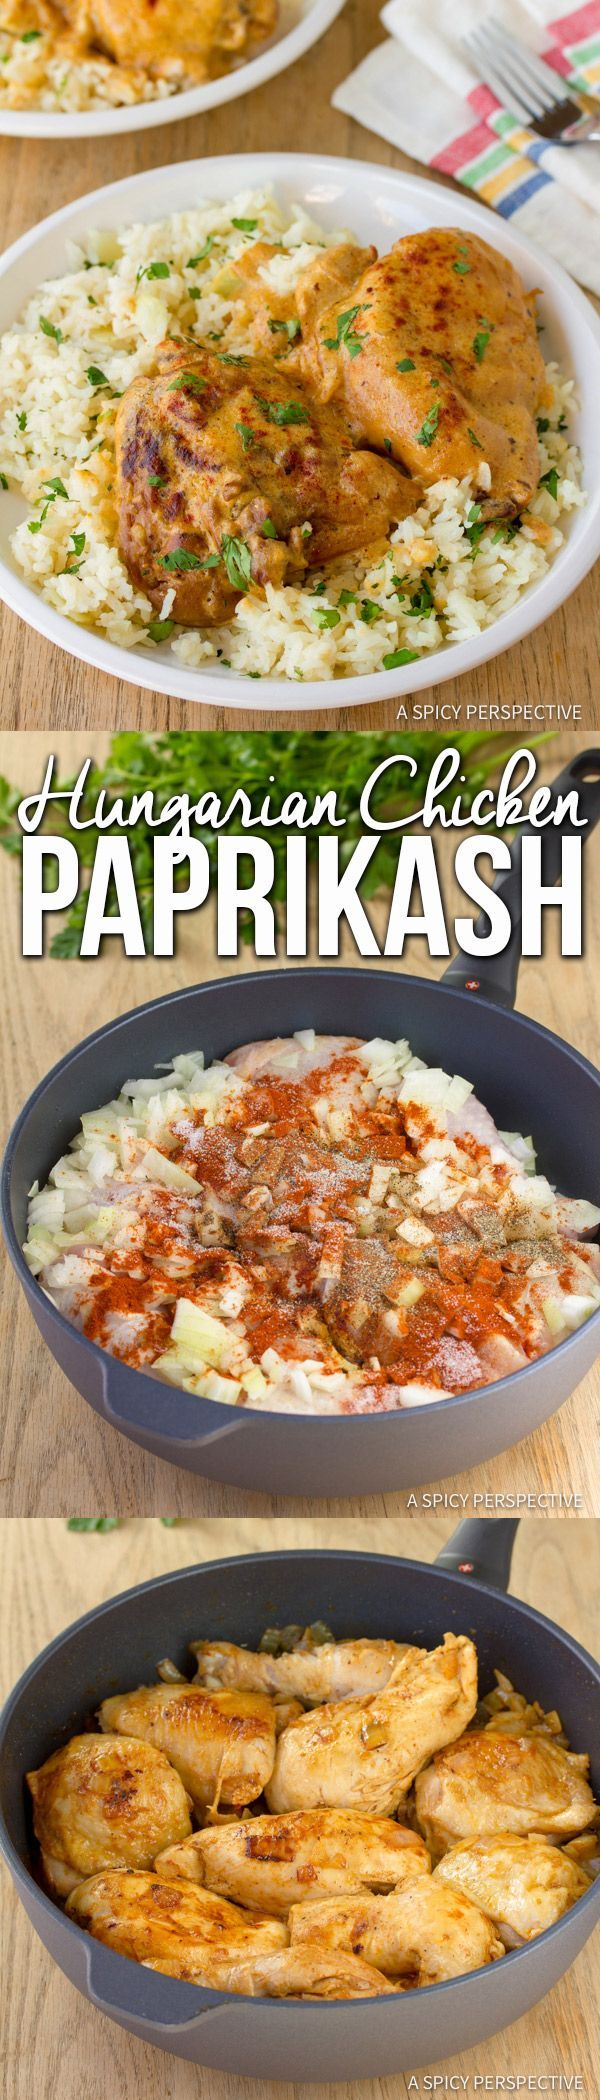 Creamy Hungarian Chicken Paprikash (Paprikas) | ASpicyPerspective.com